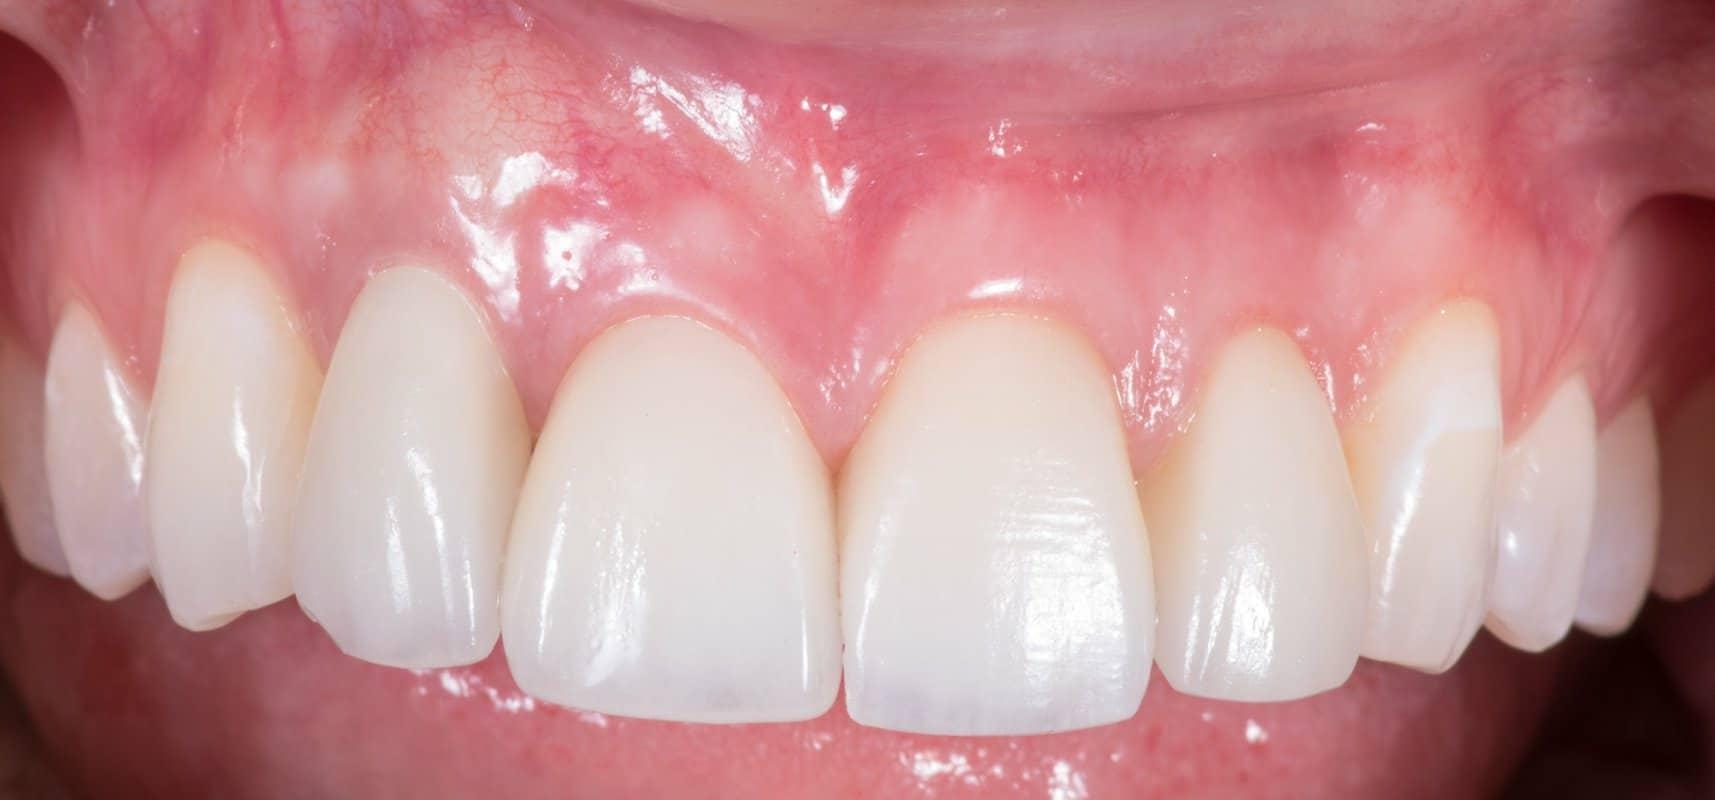 ArtLab Dentistry patient Alicia after restoration treatment.